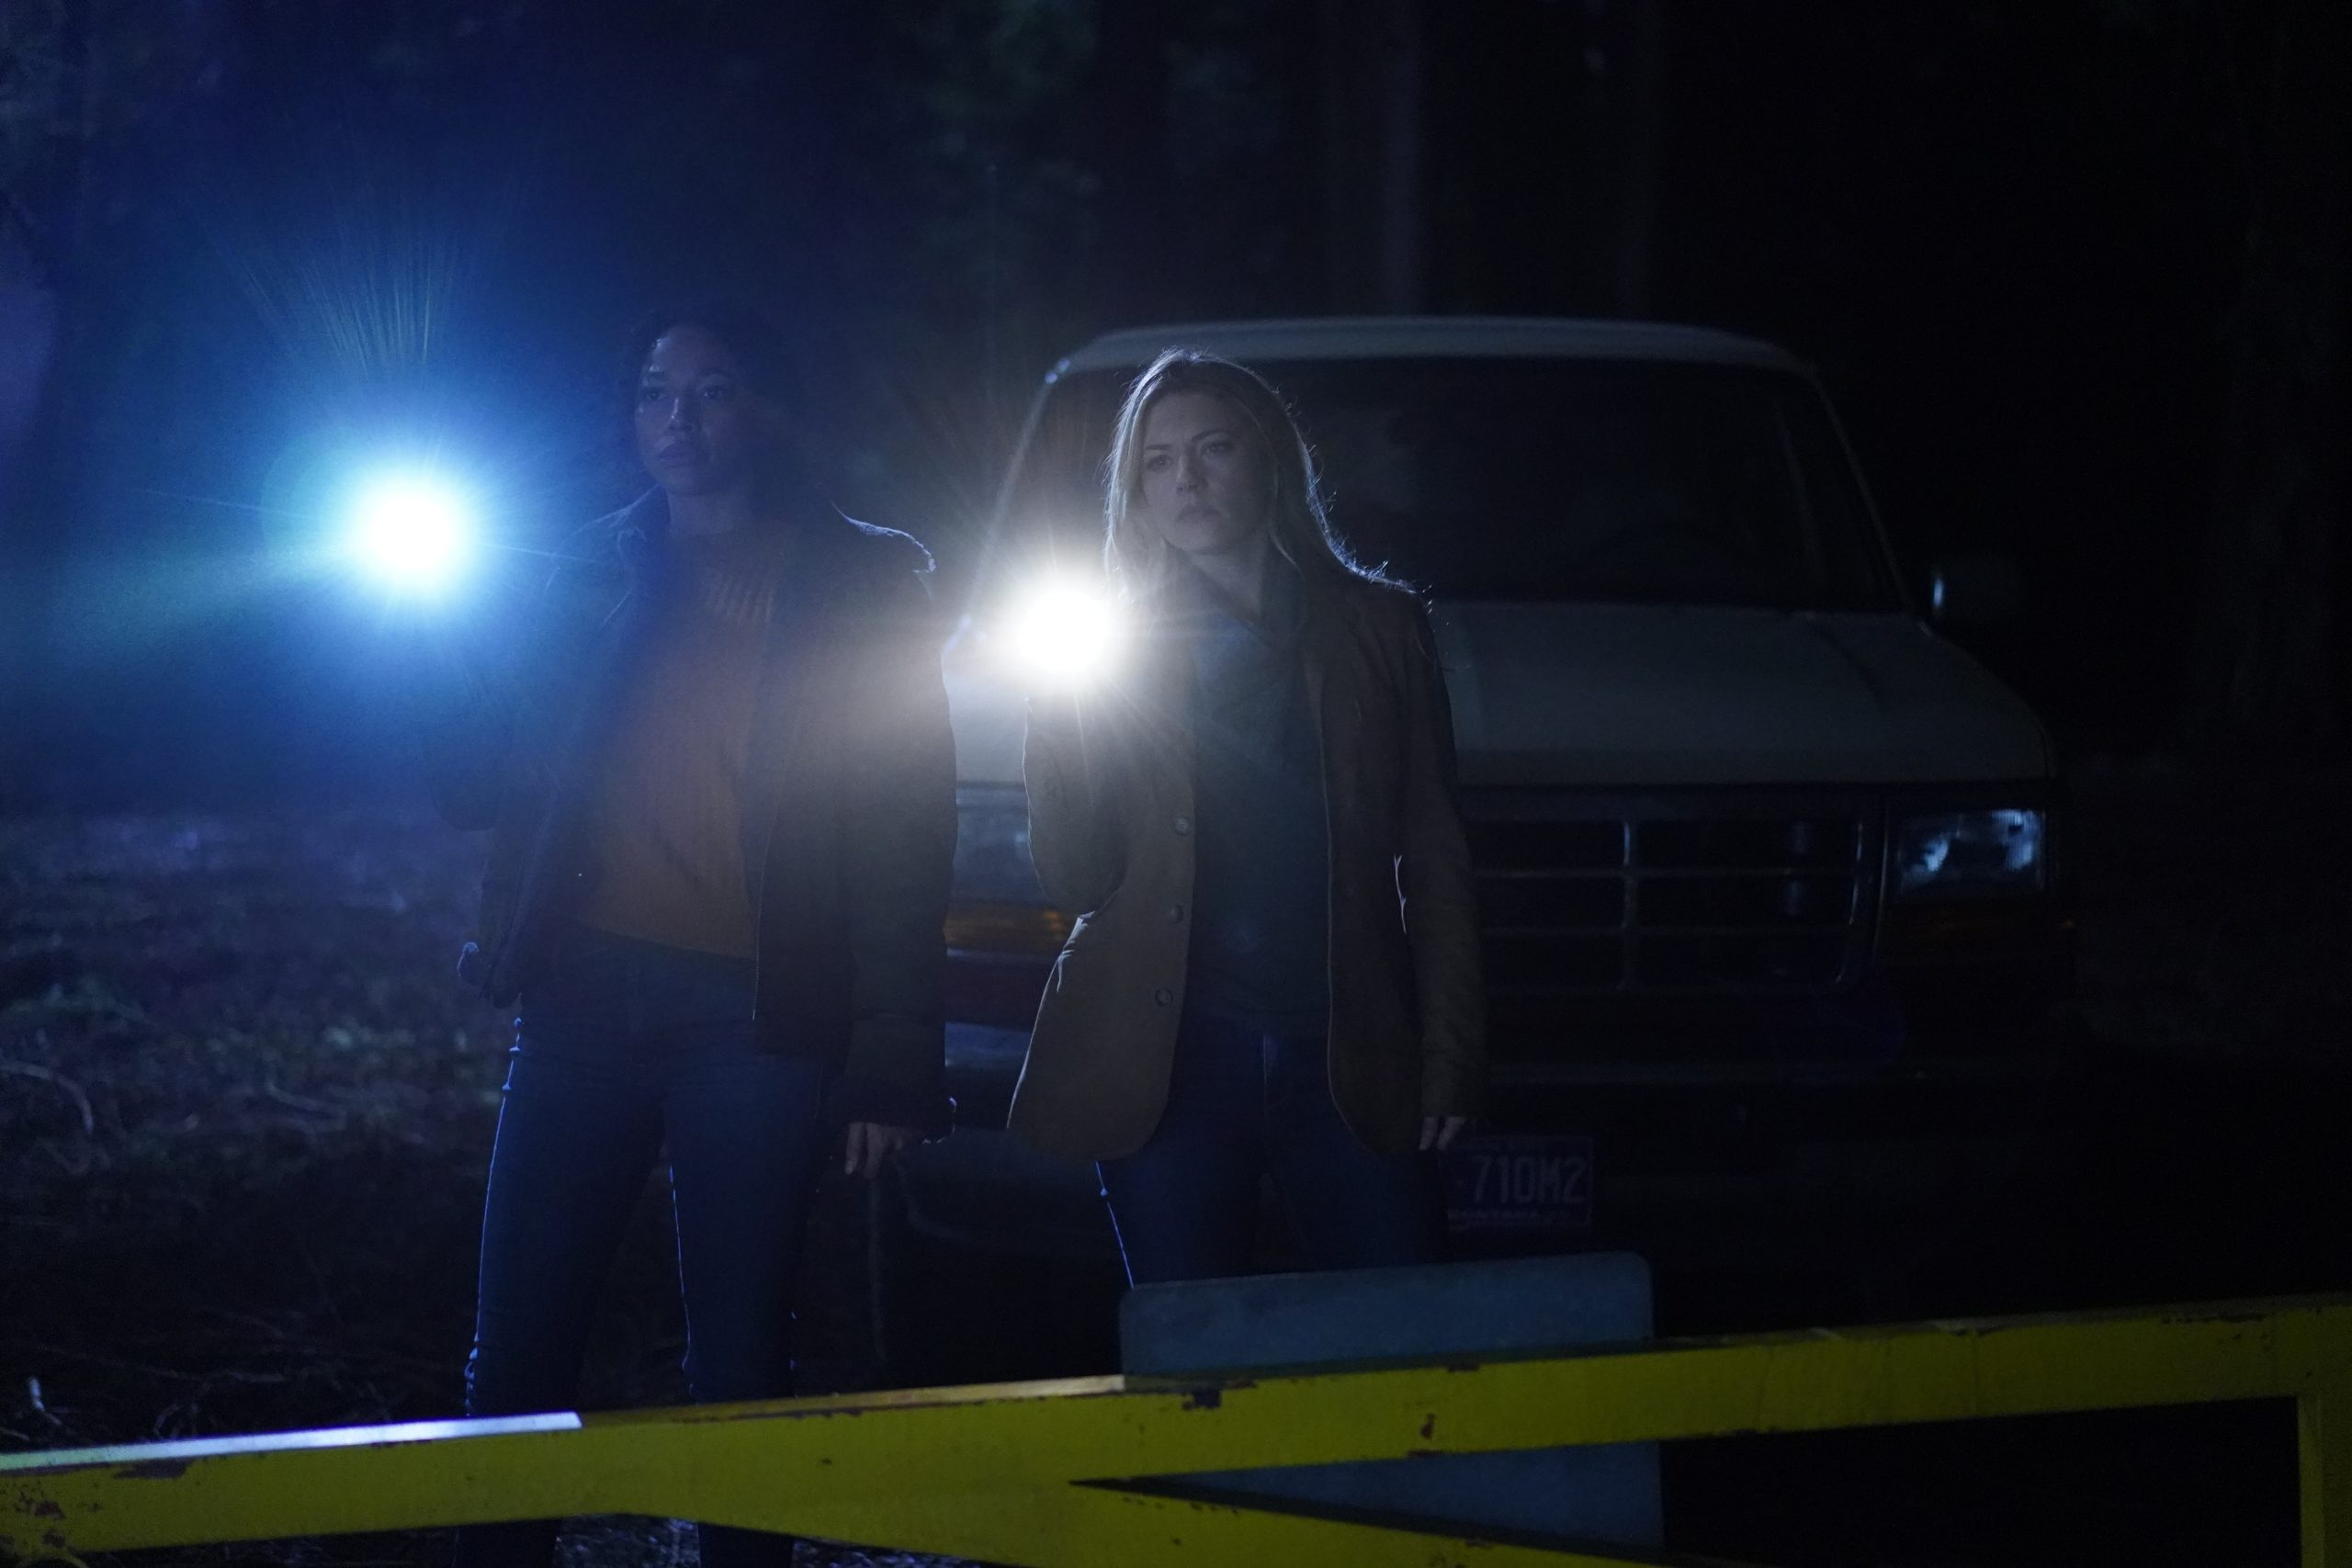 Big Sky Review No Bwetter Than Dogs Season 1 Episode 12